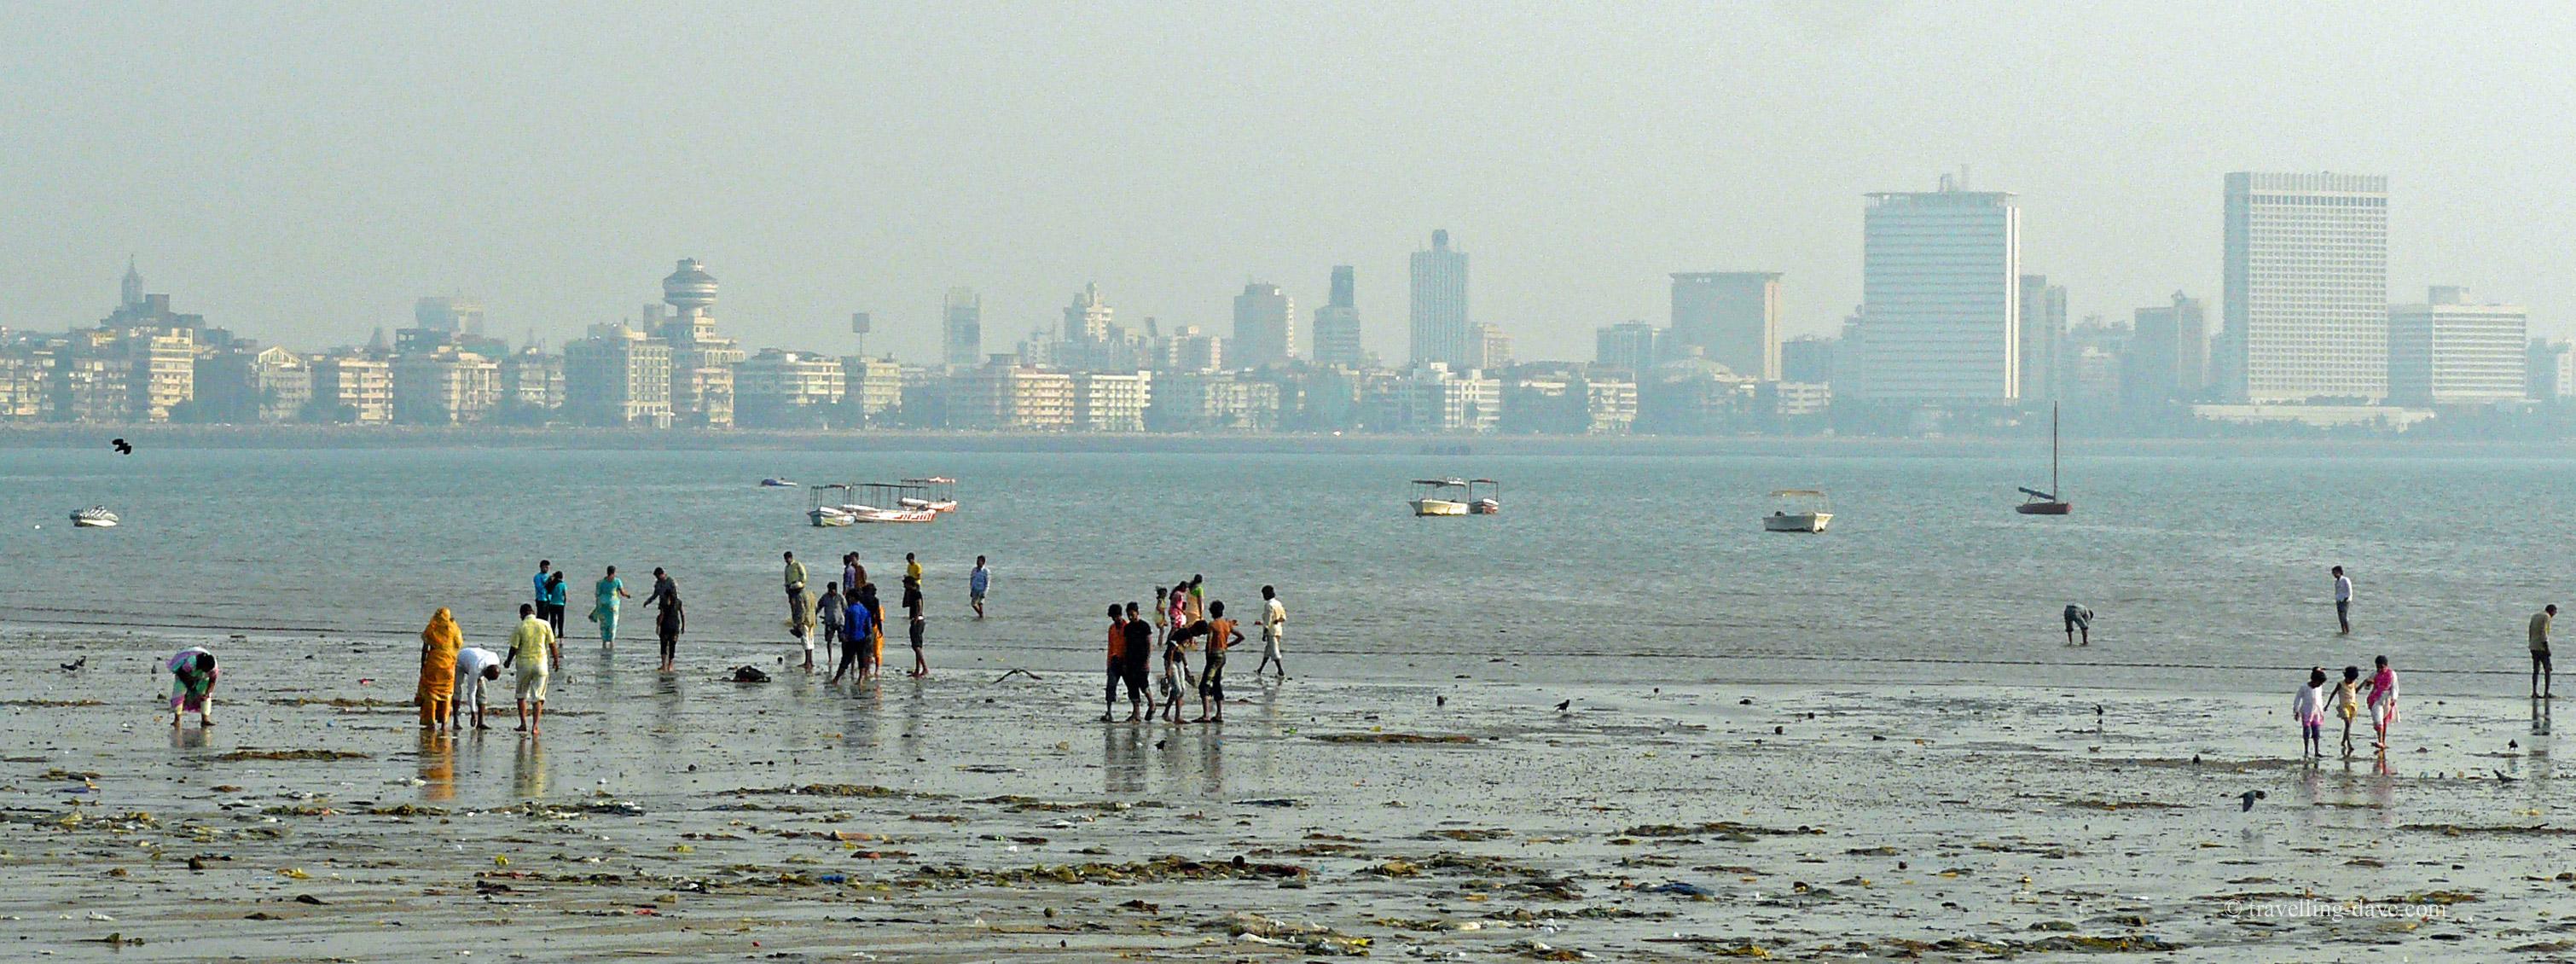 Mumbai skyline and people on the beach